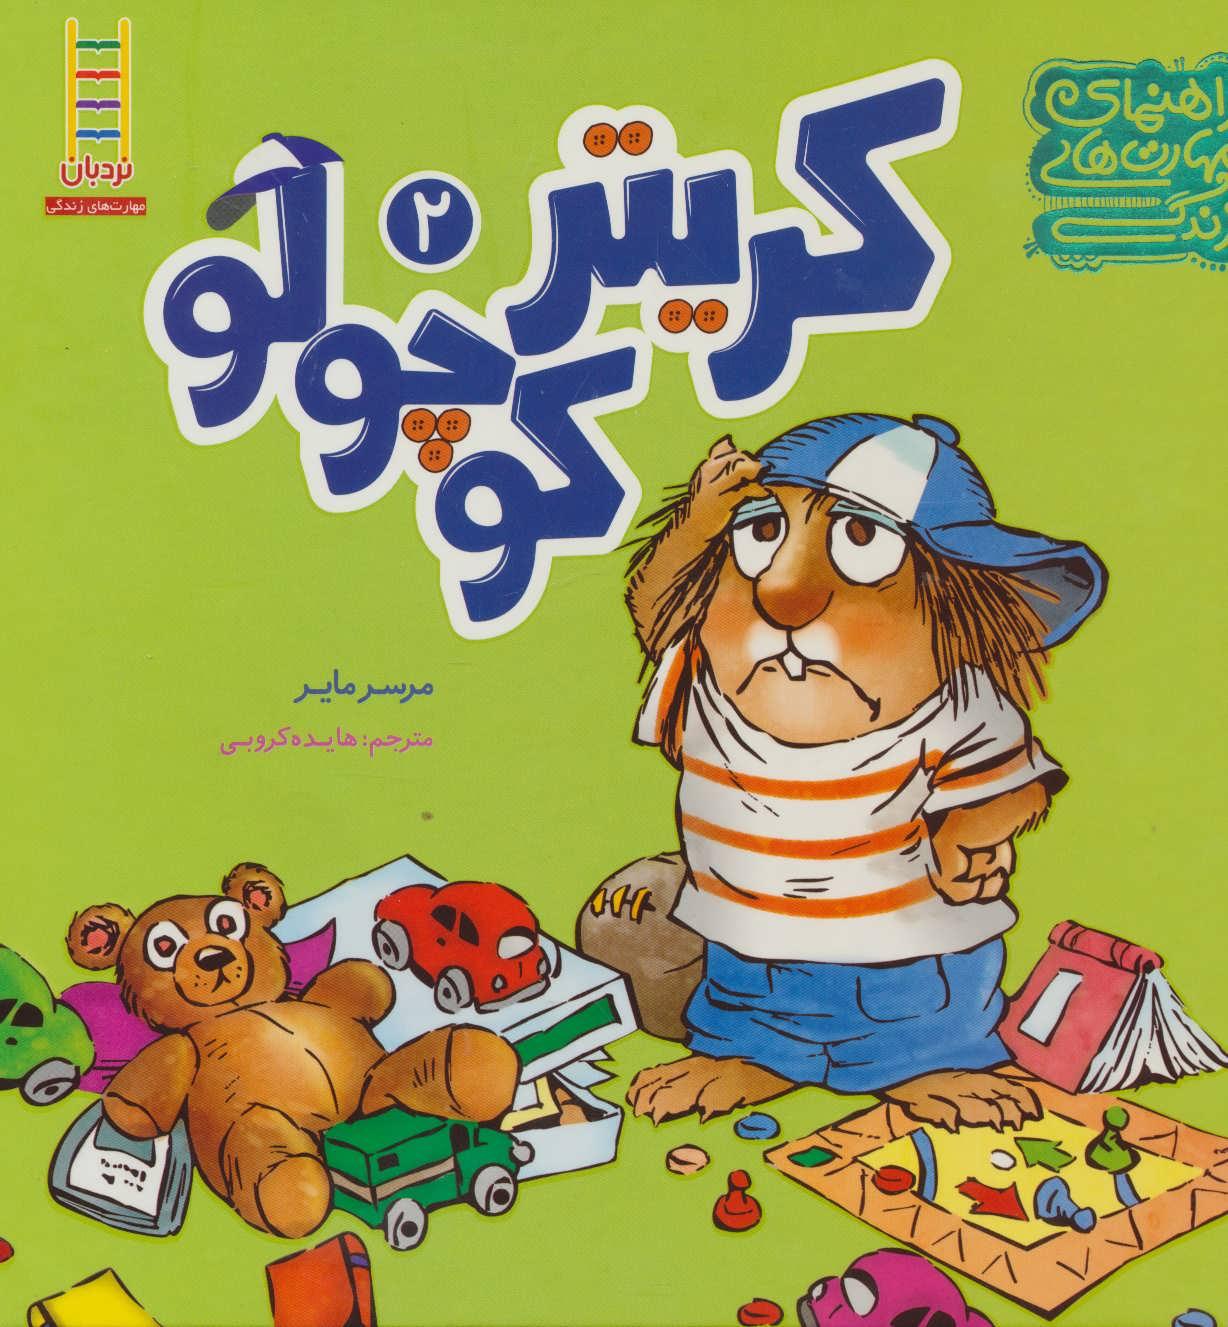 کتاب مجموعه کریتر کوچولو 2